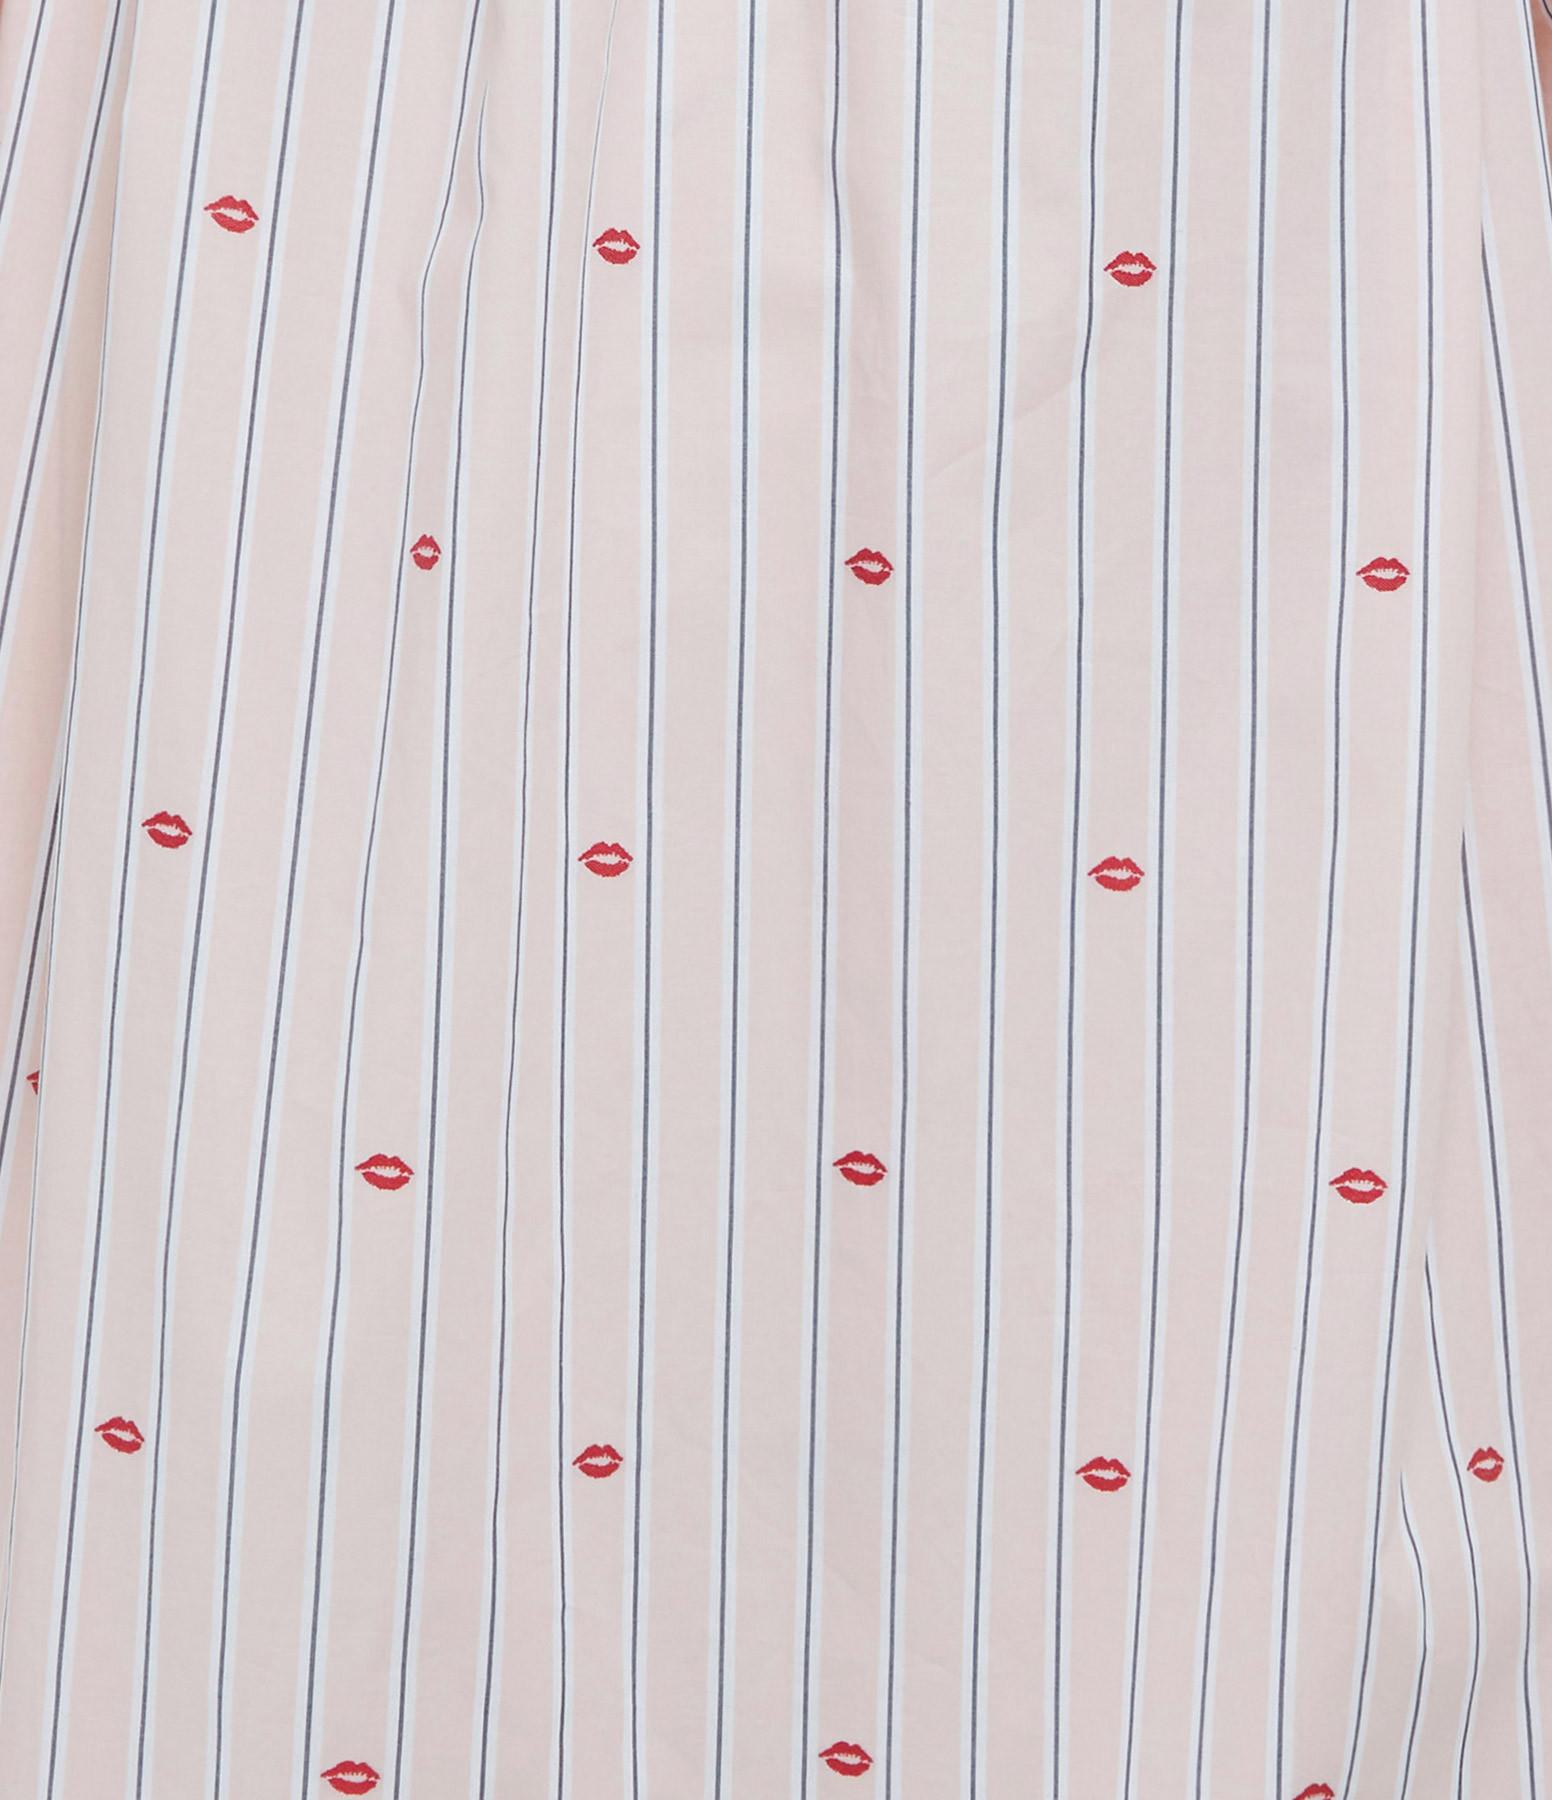 VICTORIA VICTORIA BECKHAM - Robe Lips Jacquard Coton Rose